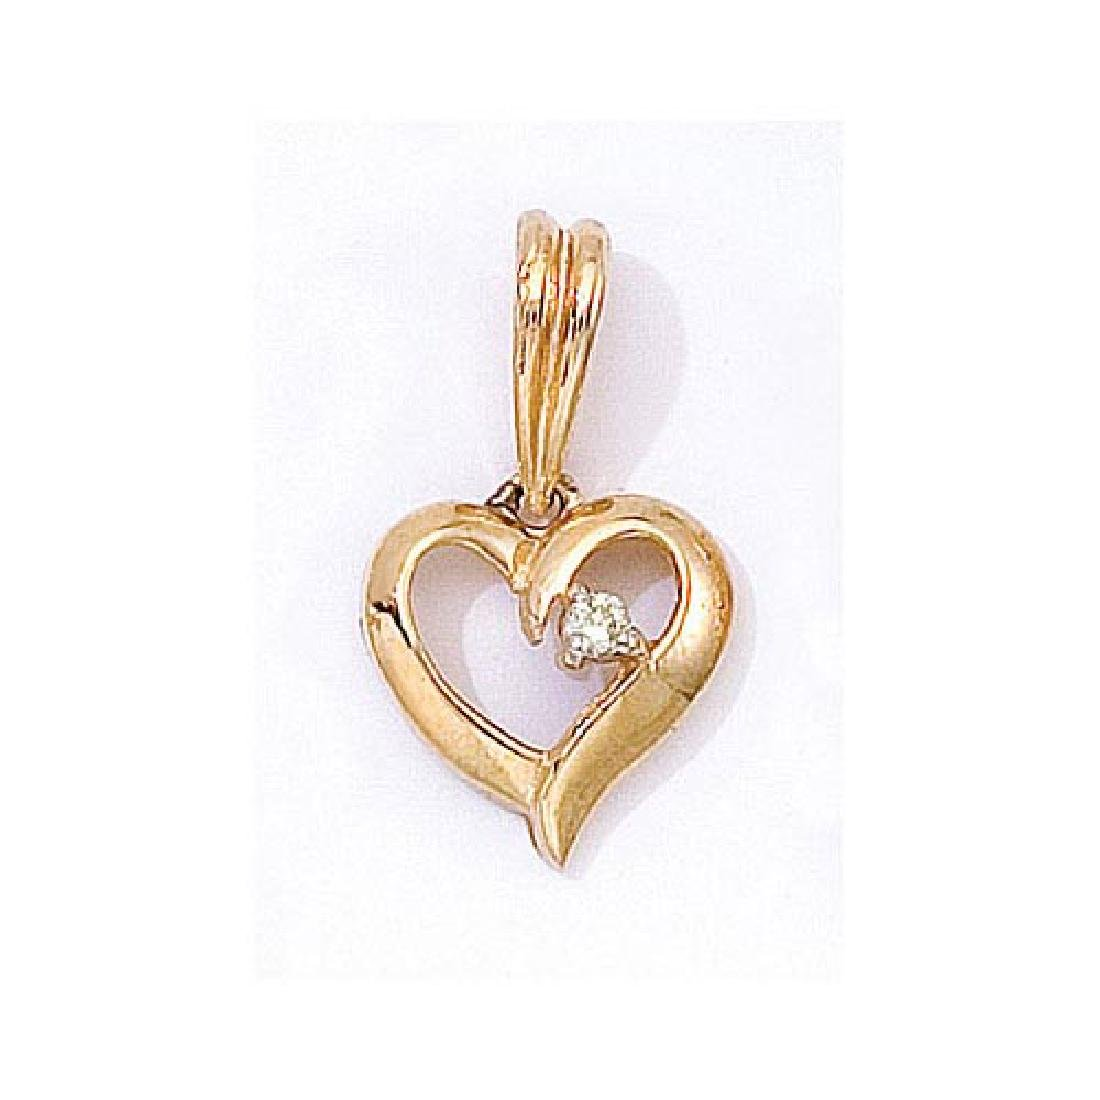 Certified 14K Yellow Gold Diamond Heart Pendant 0.03 CT